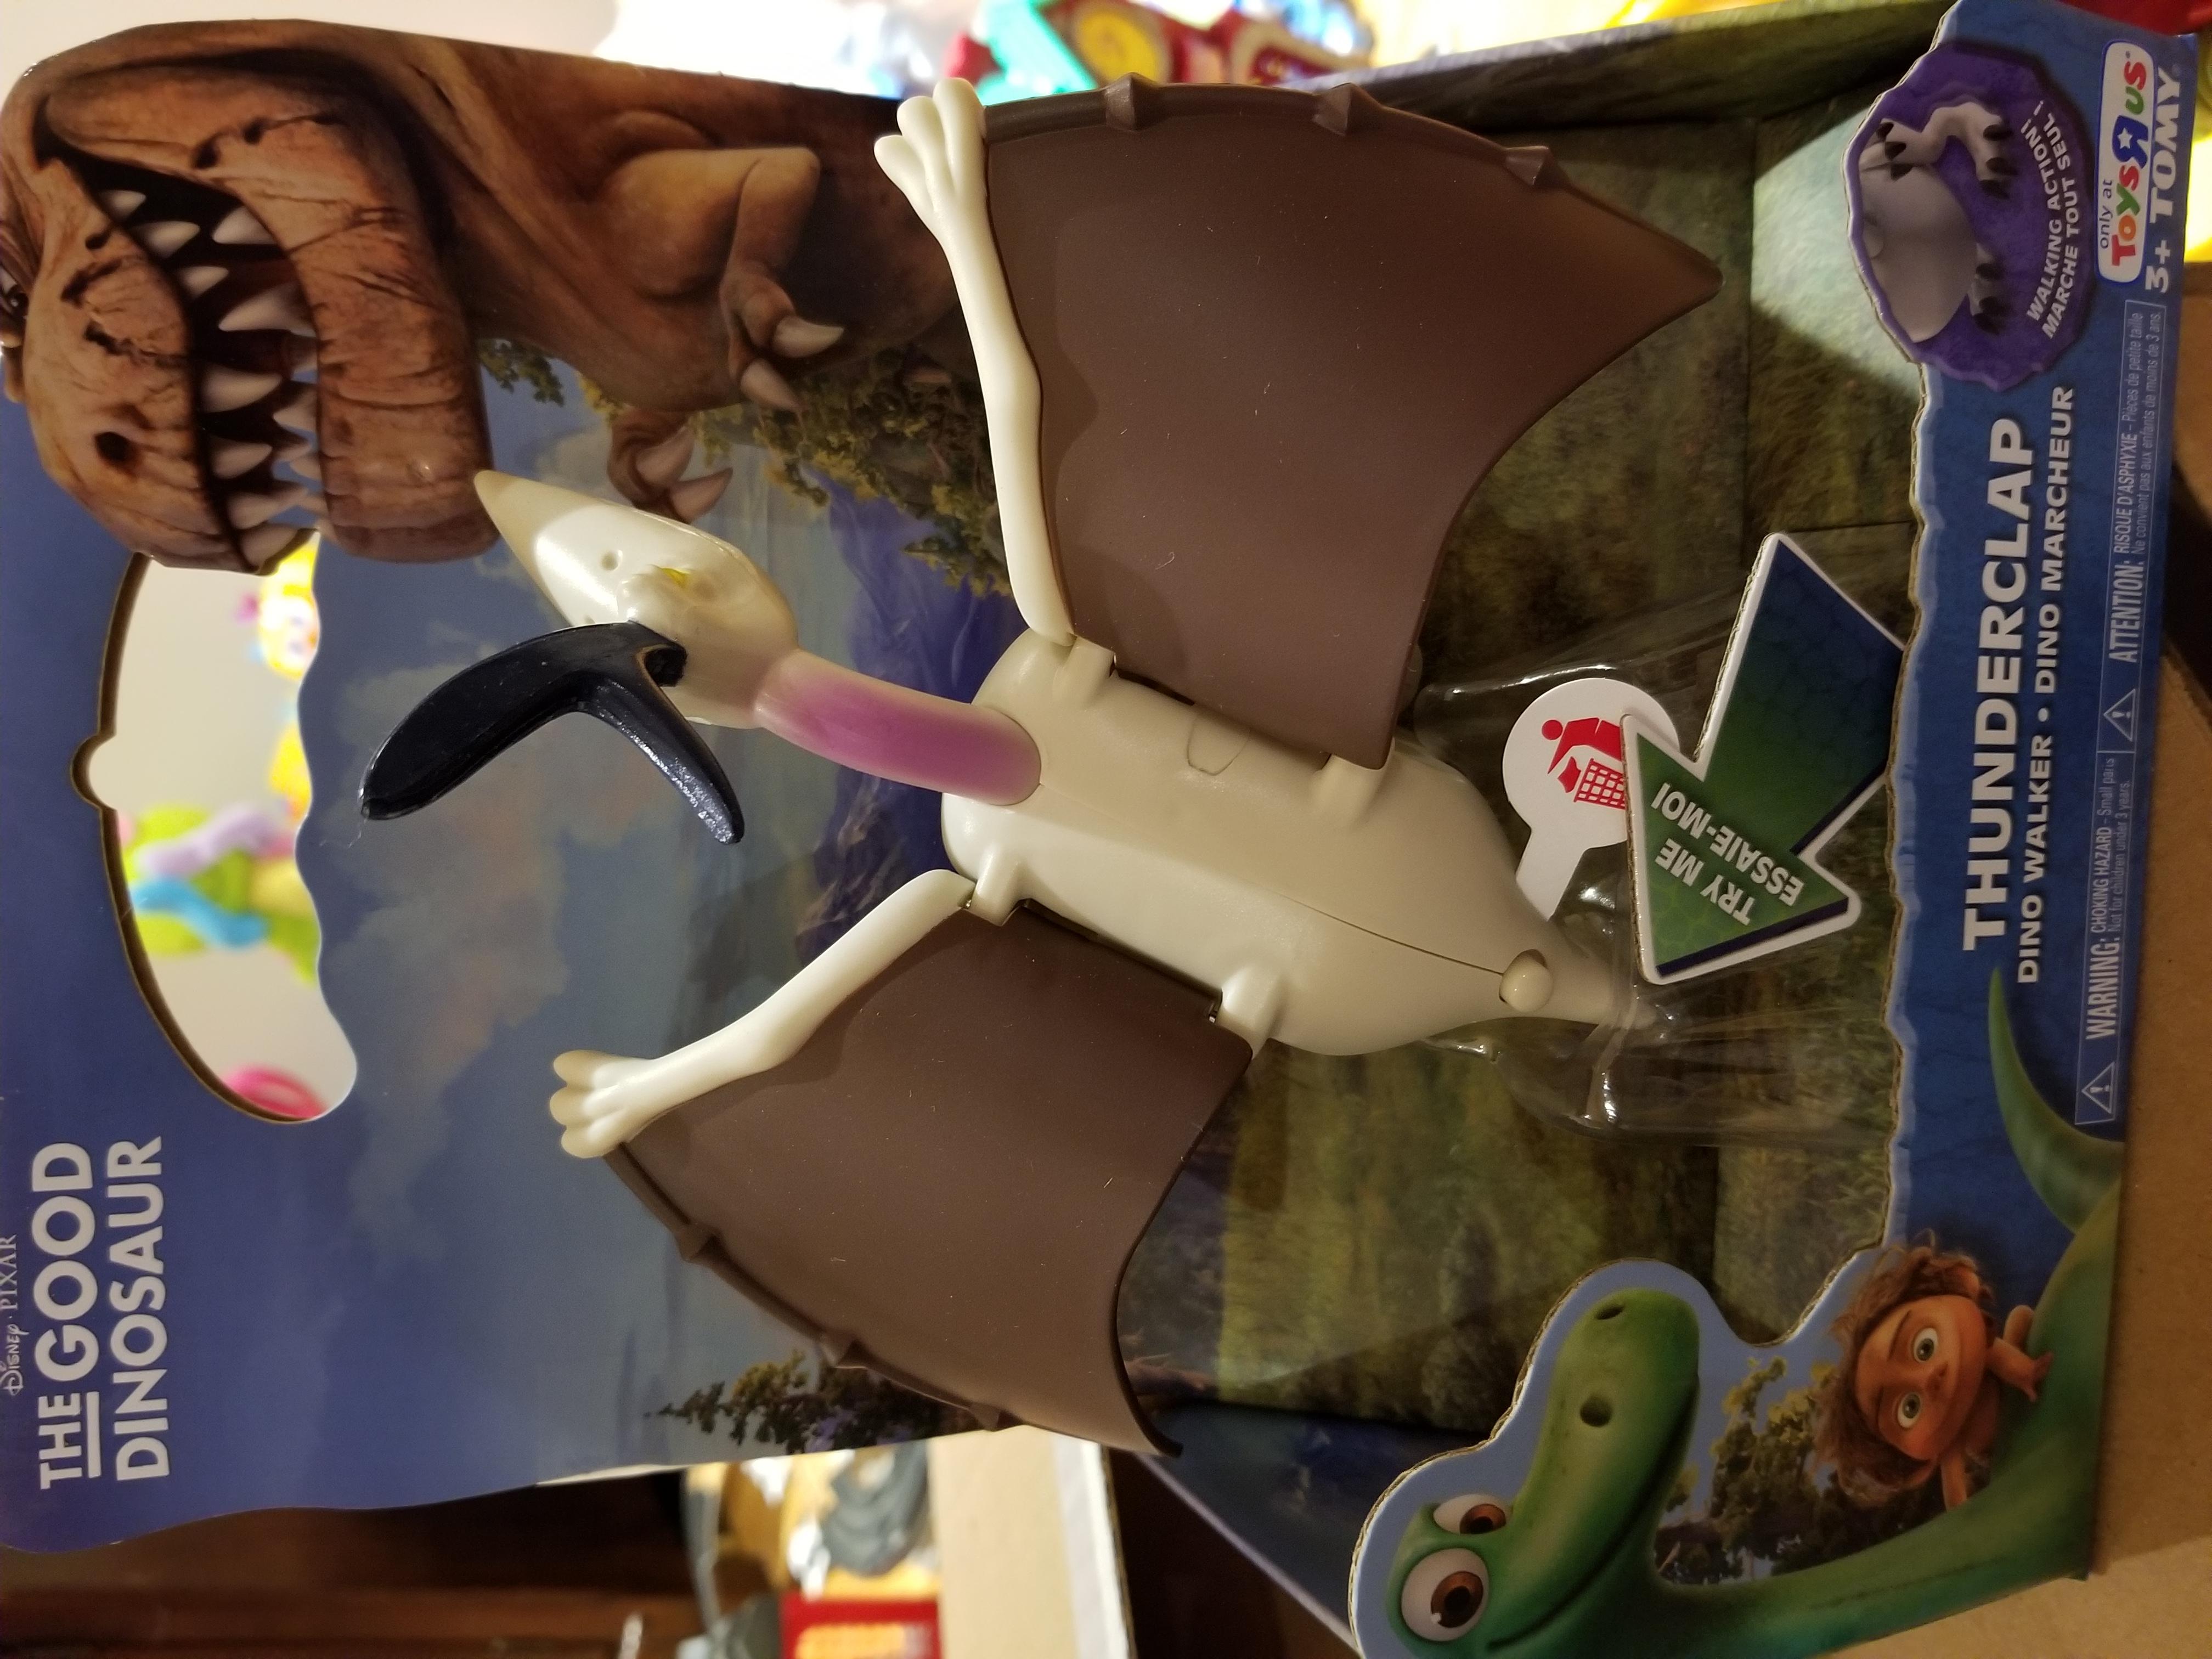 The good dinosaur- thunderclap dino walker